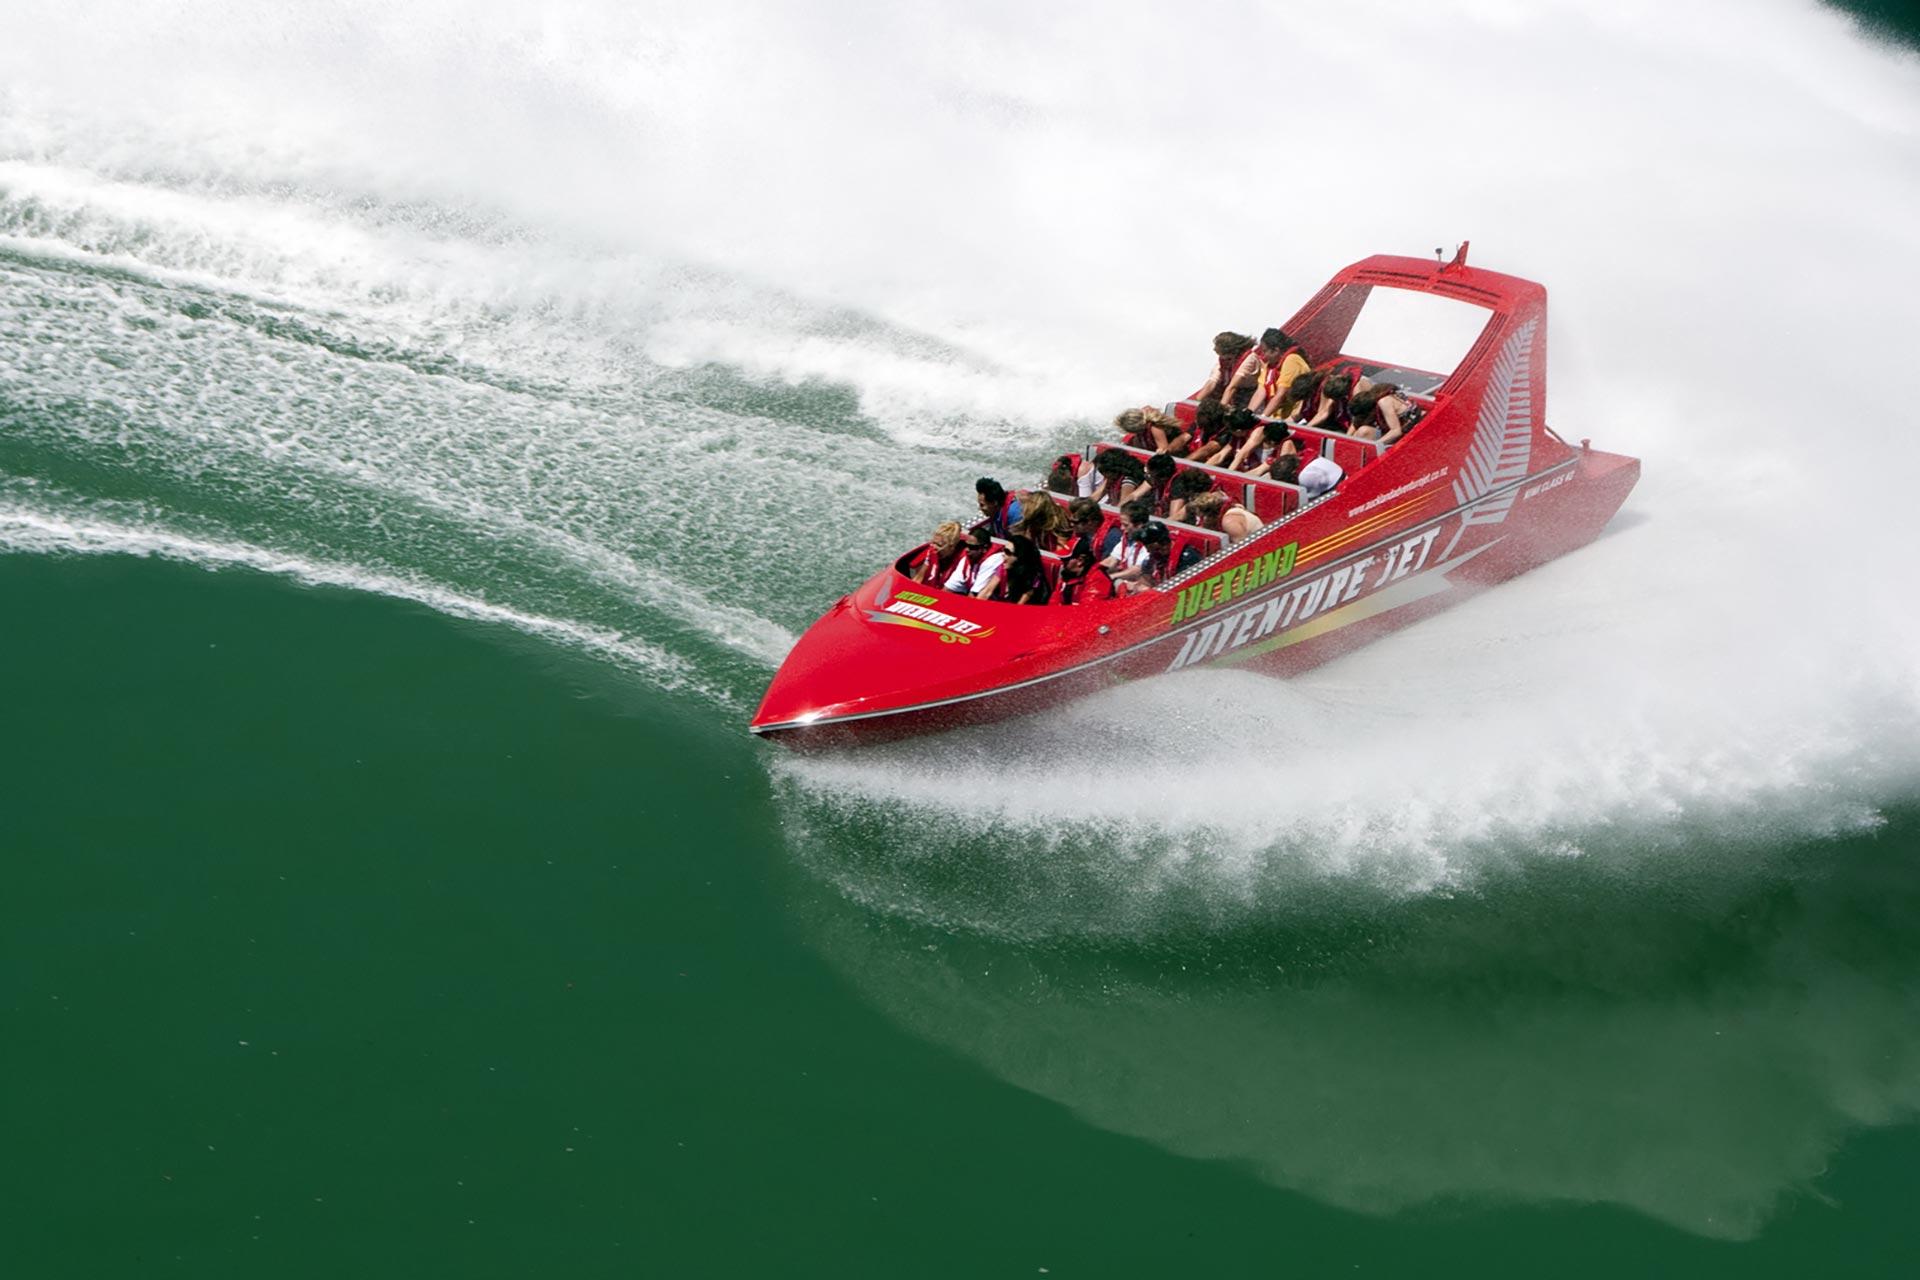 auckland-adventure-jet-Image-4